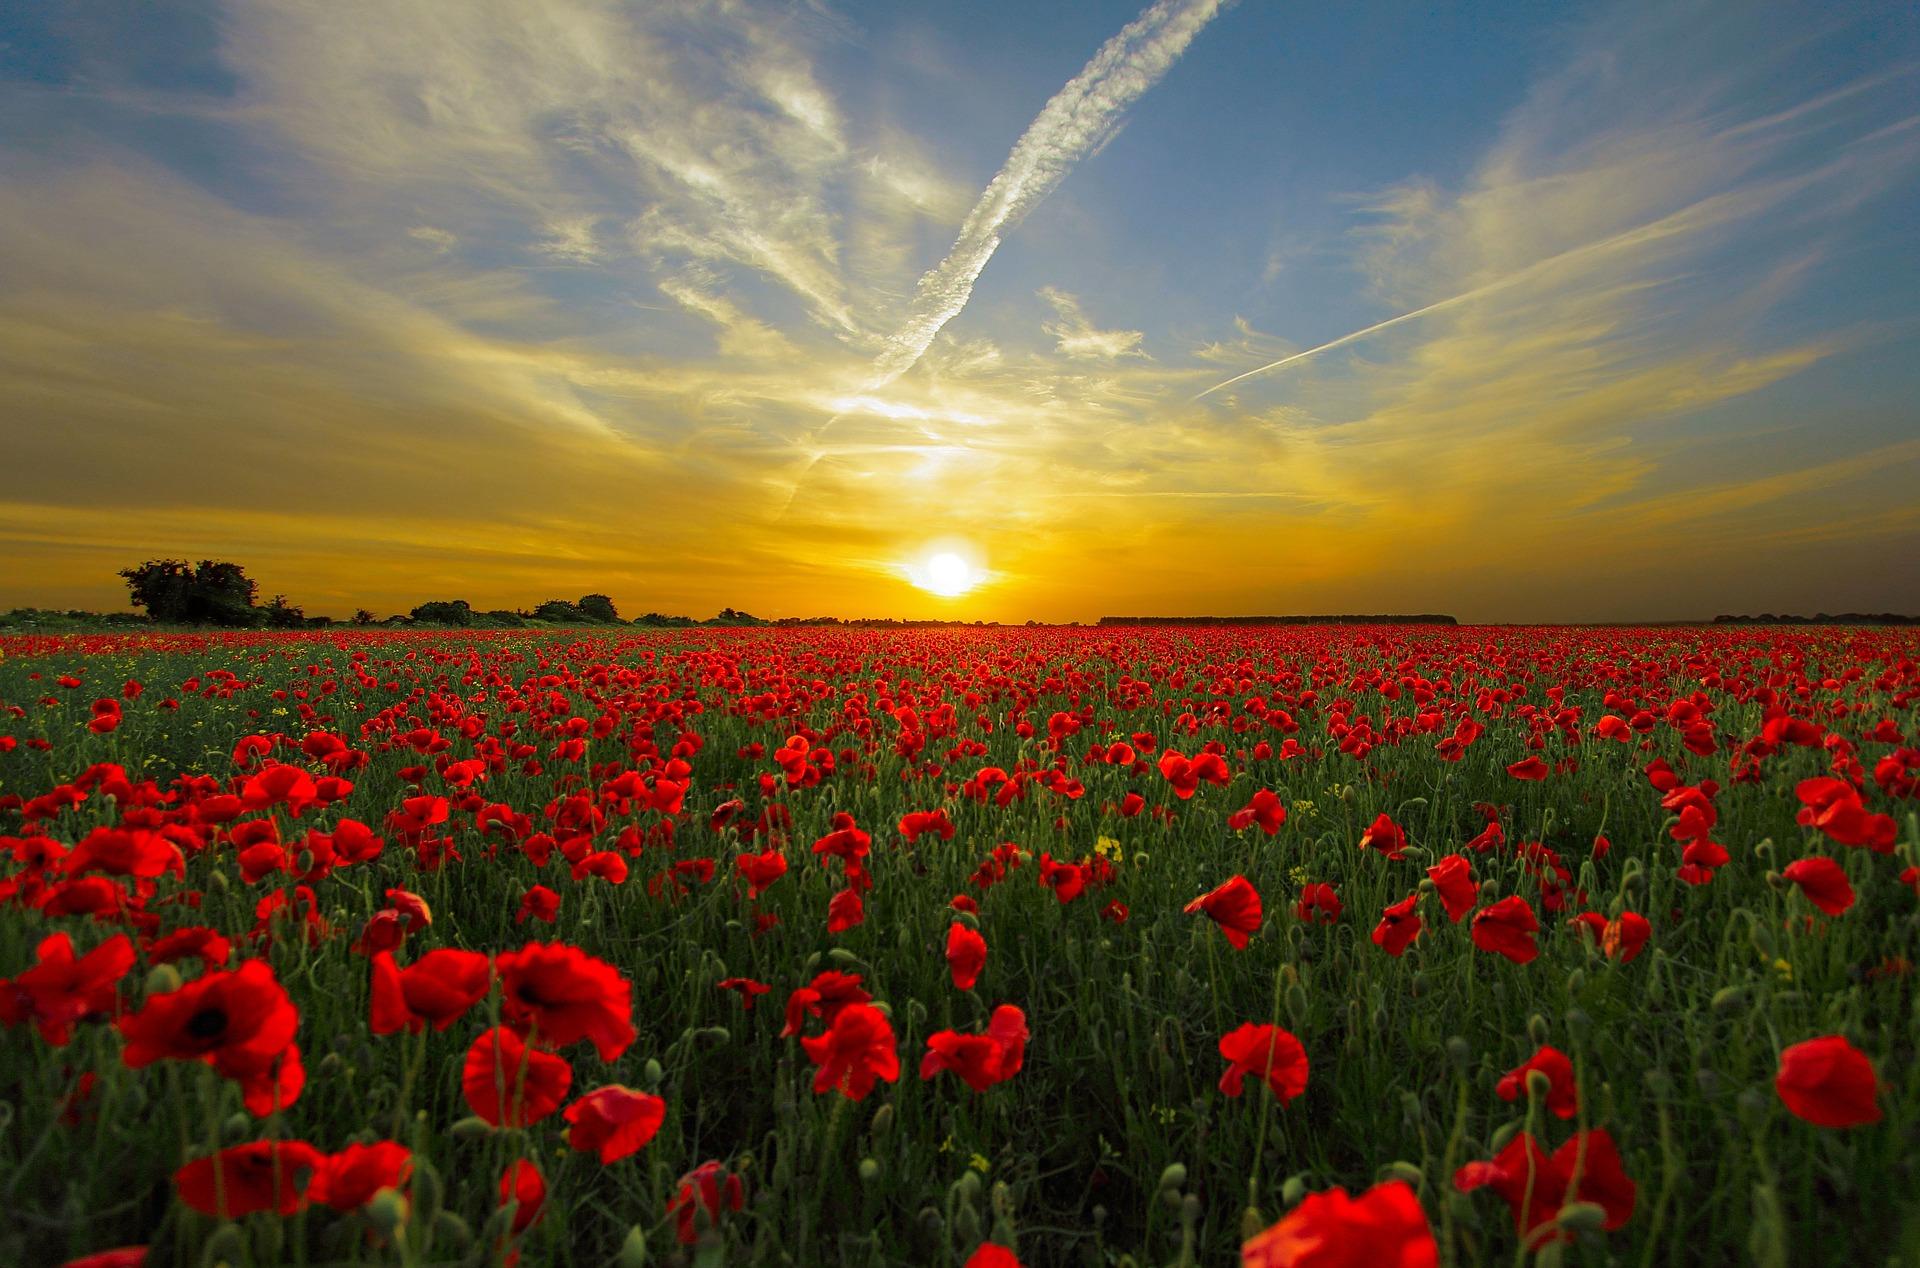 Shemesh Word: Shemesh: Shining Like The Sun